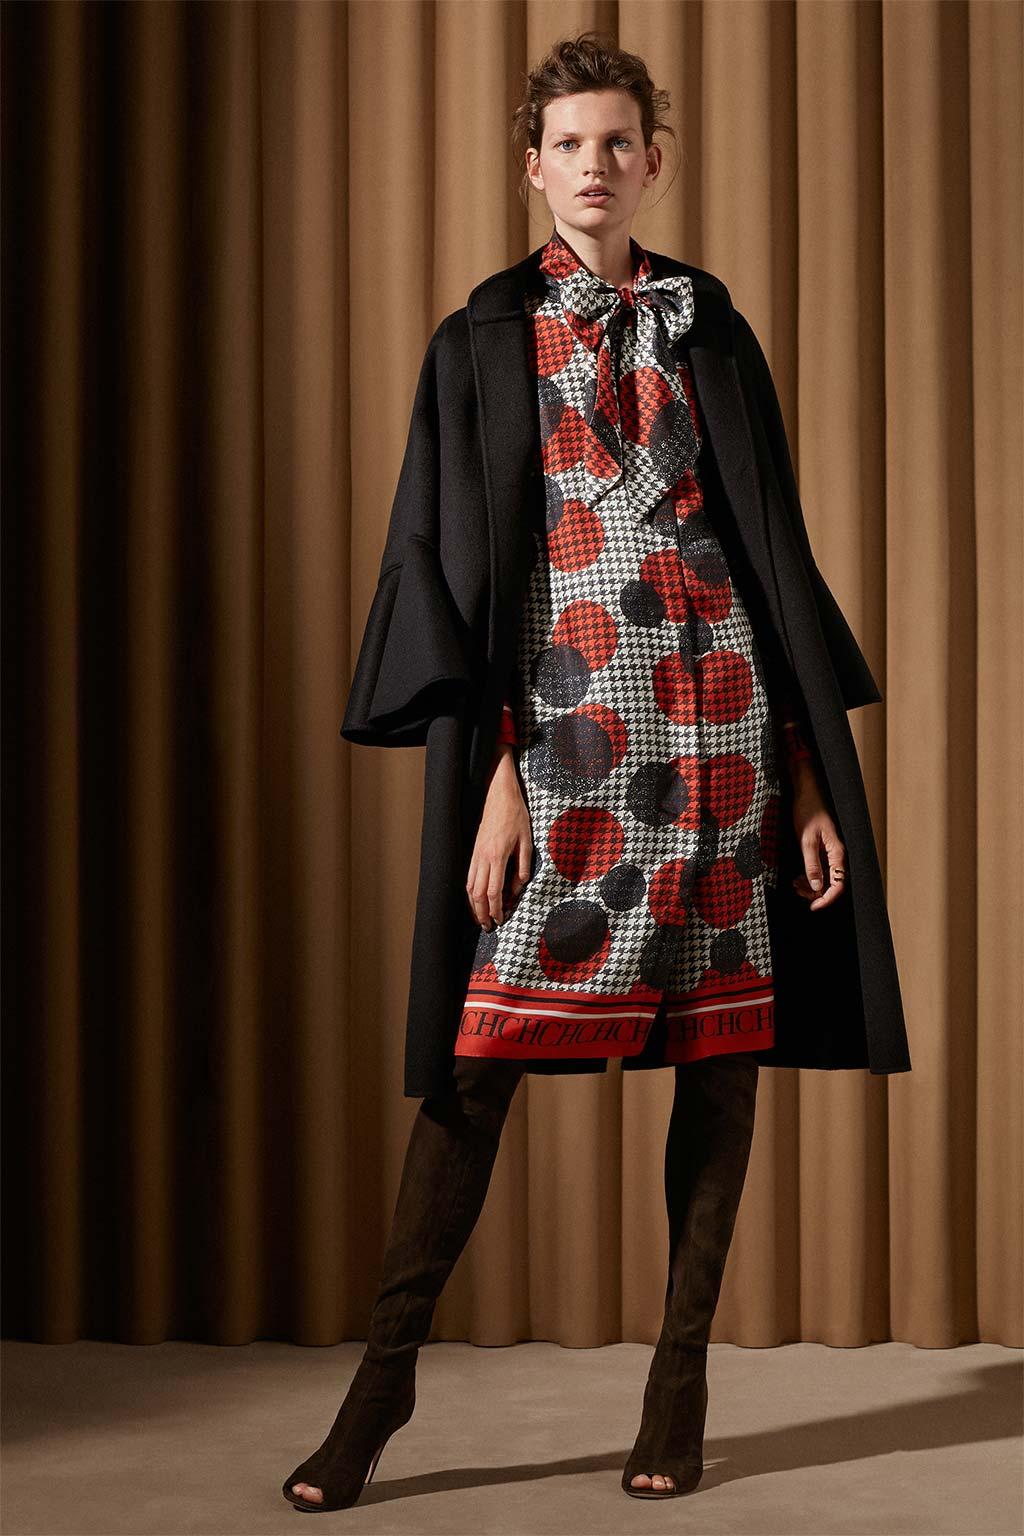 CH Carolina Herrera. New womenswear collection Spotlight. Look 02